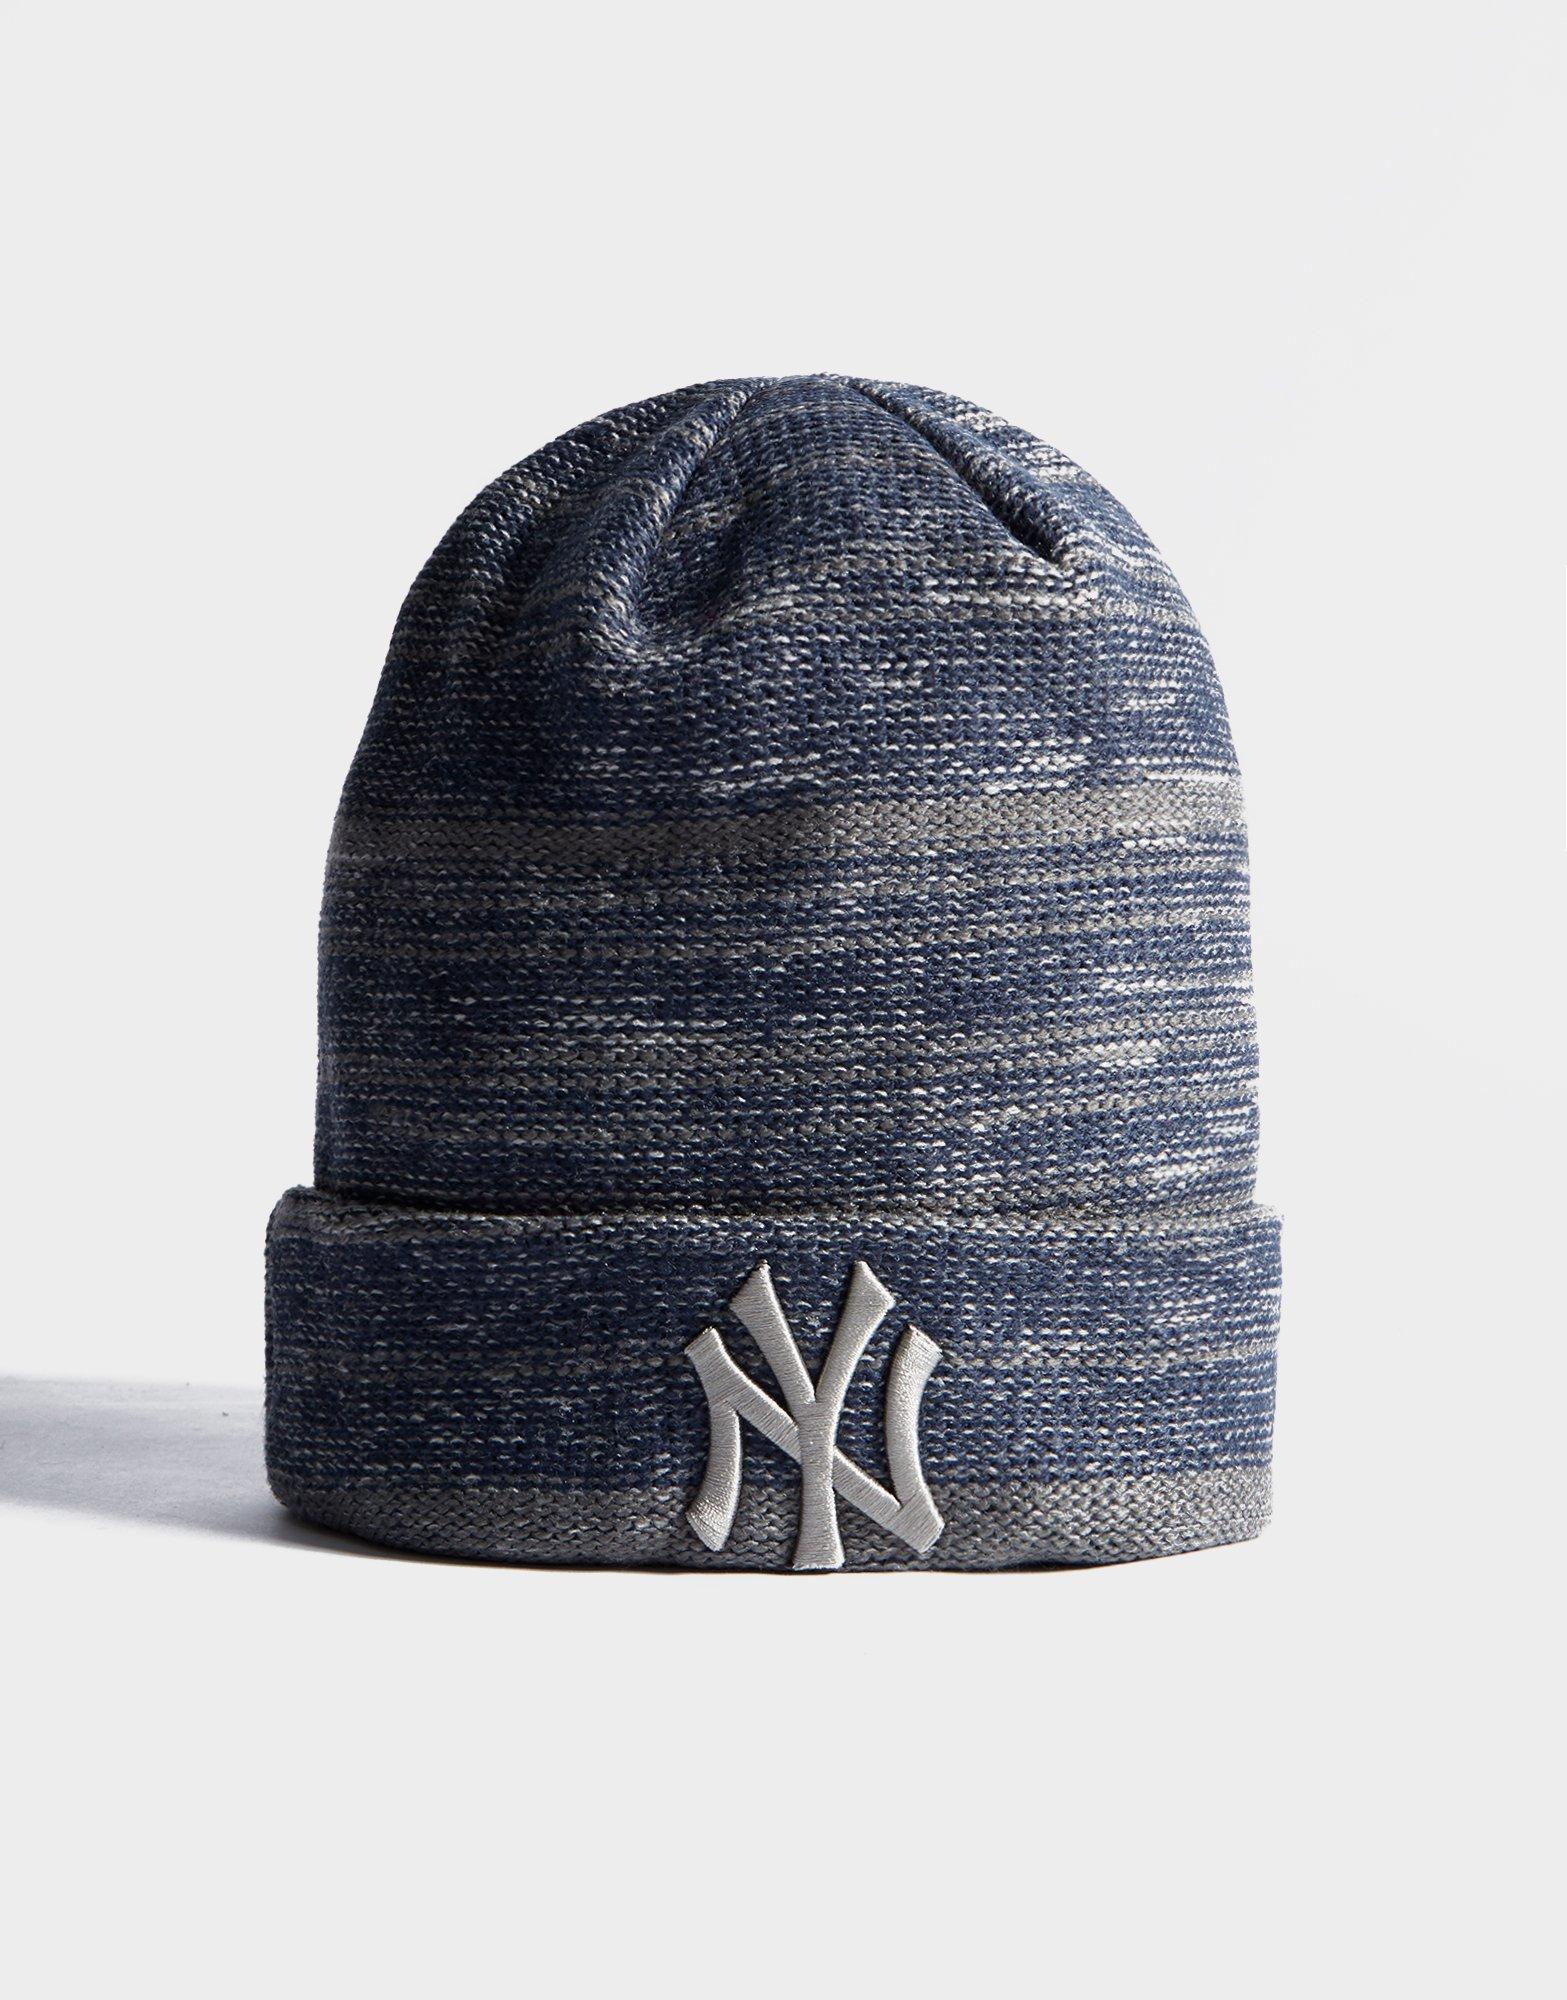 Ktz Mlb New York Yankees Beanie in Blue for Men - Lyst b7a3ae3fbb0b